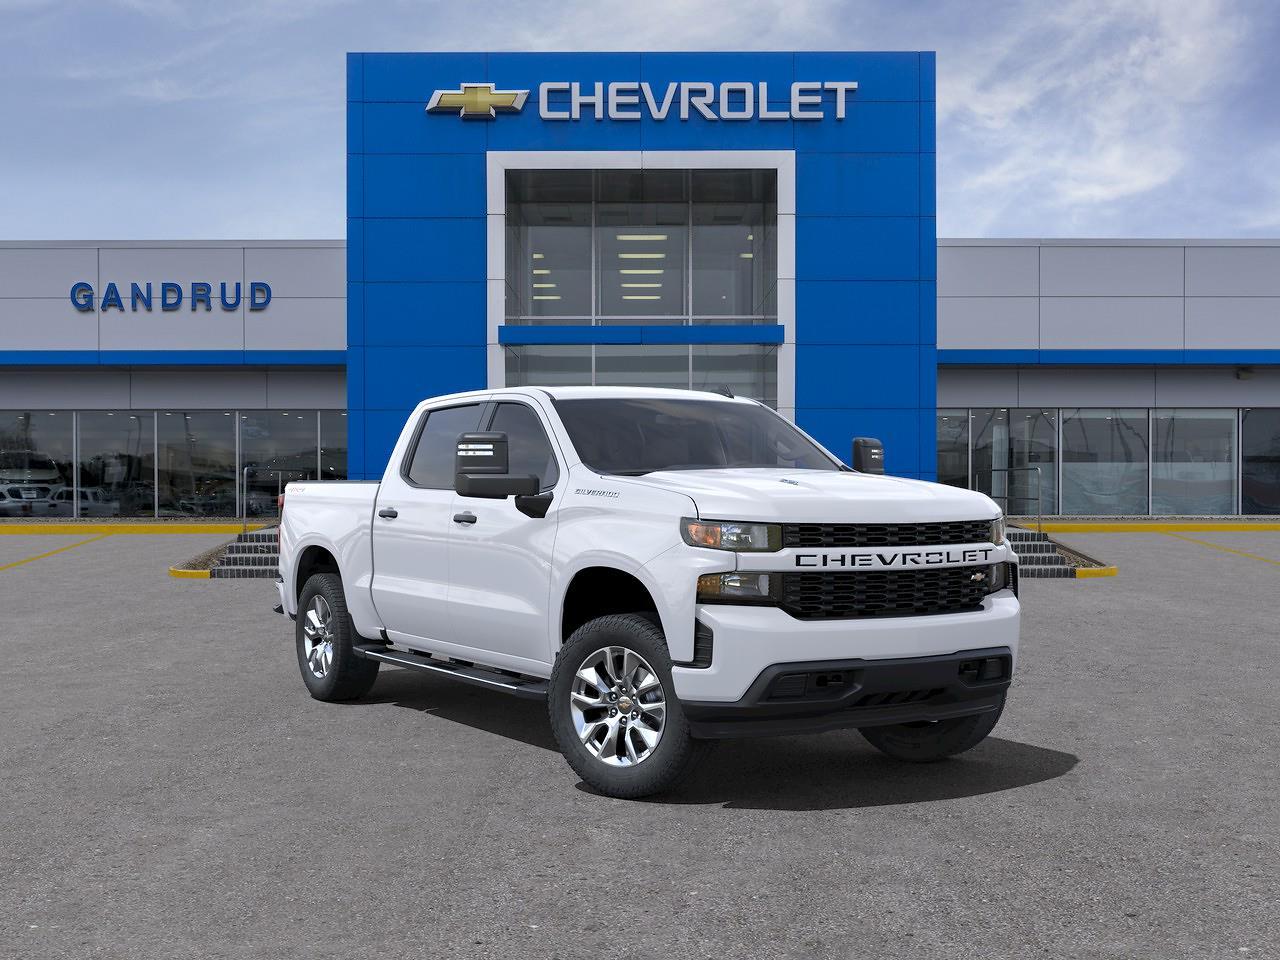 2021 Chevrolet Silverado 1500 Crew Cab 4x4, Pickup #M1314 - photo 1